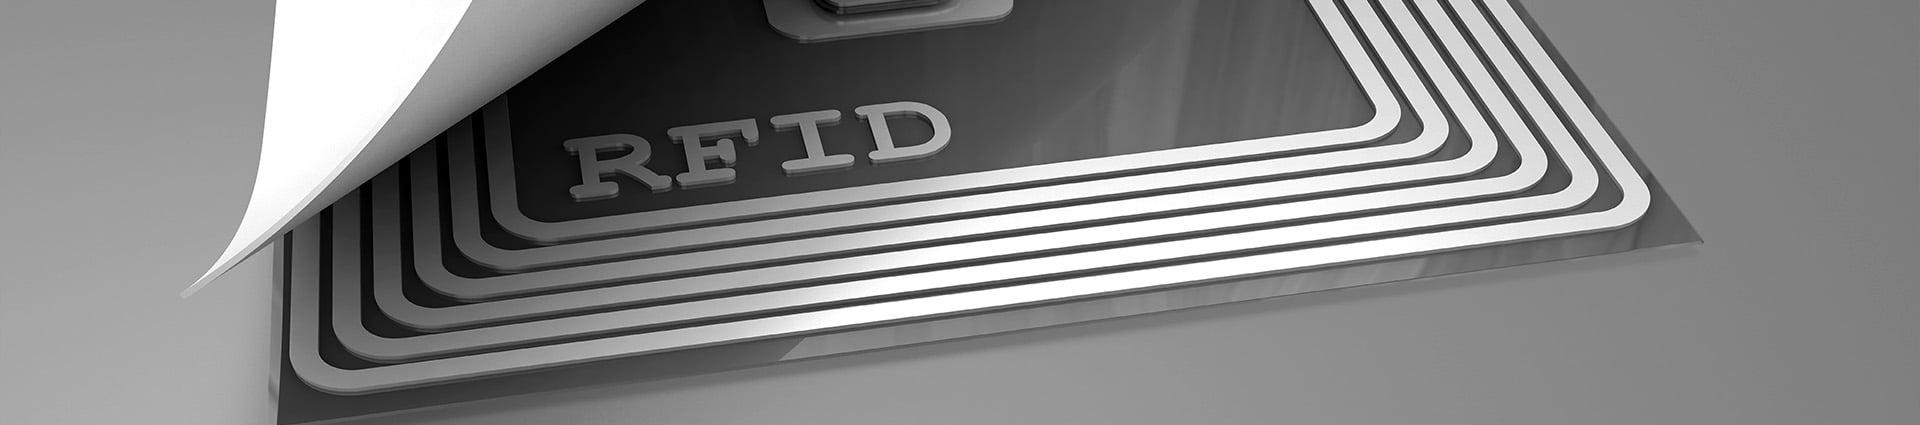 RFID security sticker